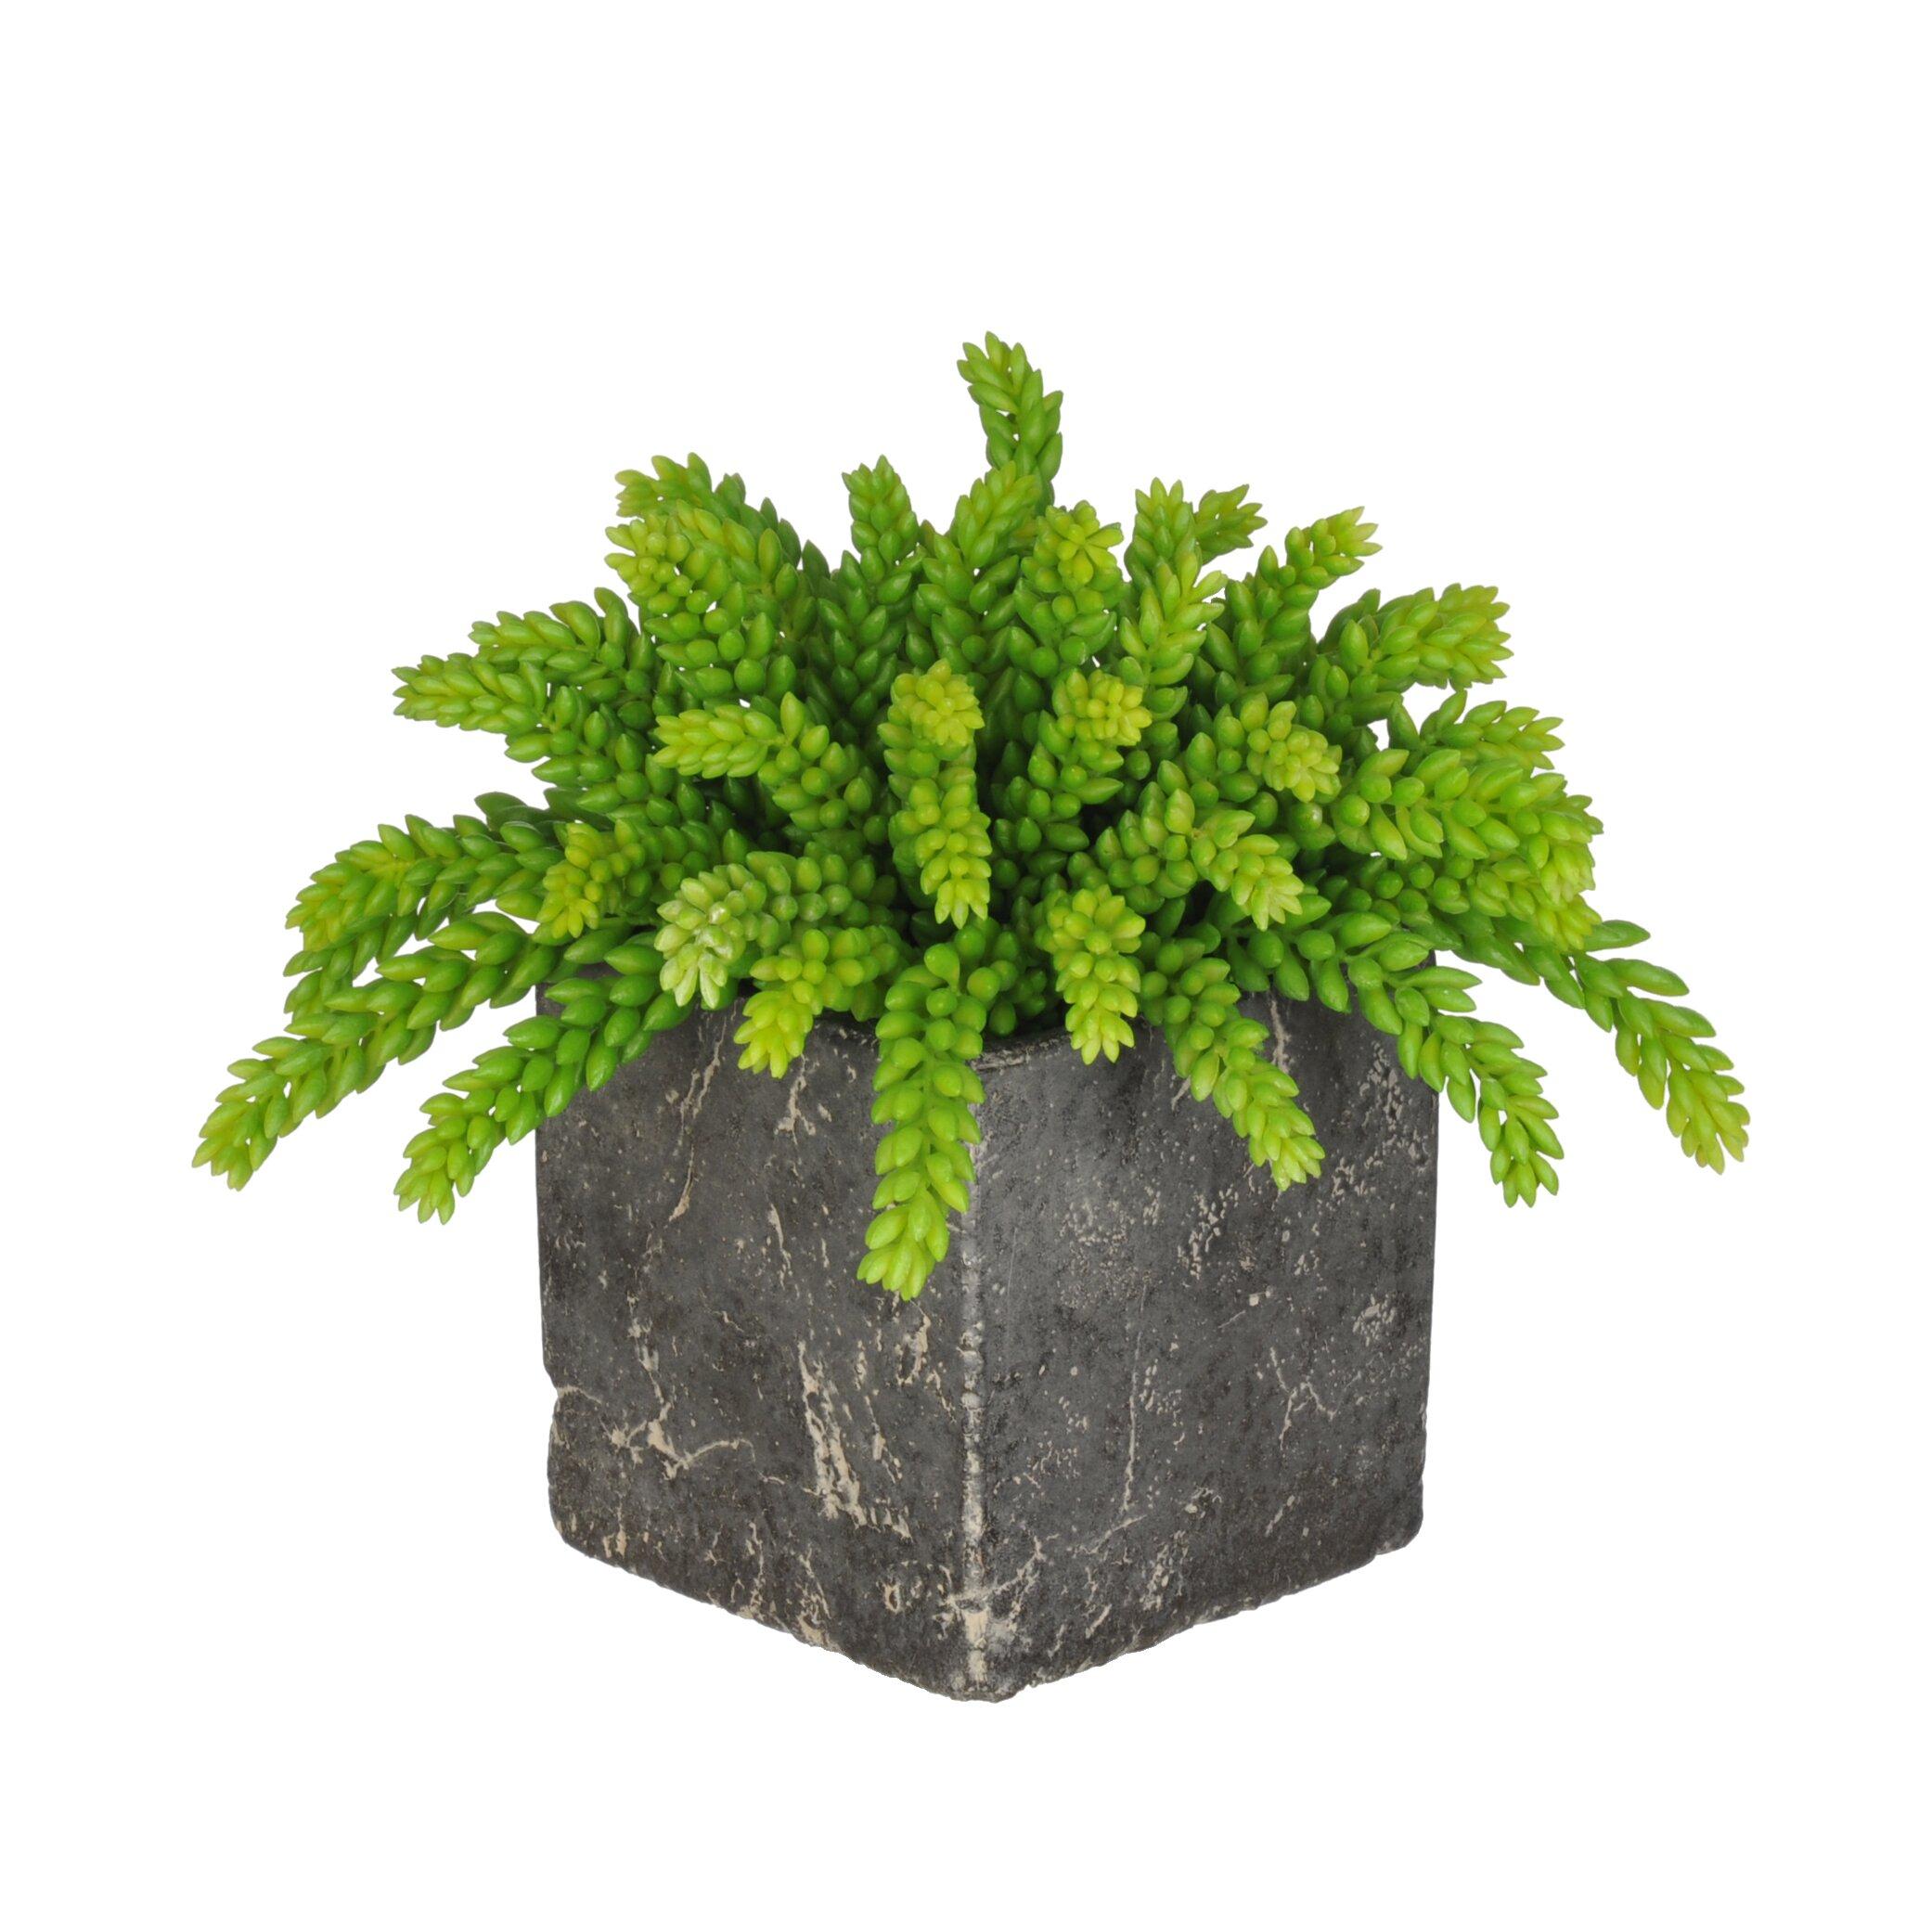 Indoor Plant For Office Desk